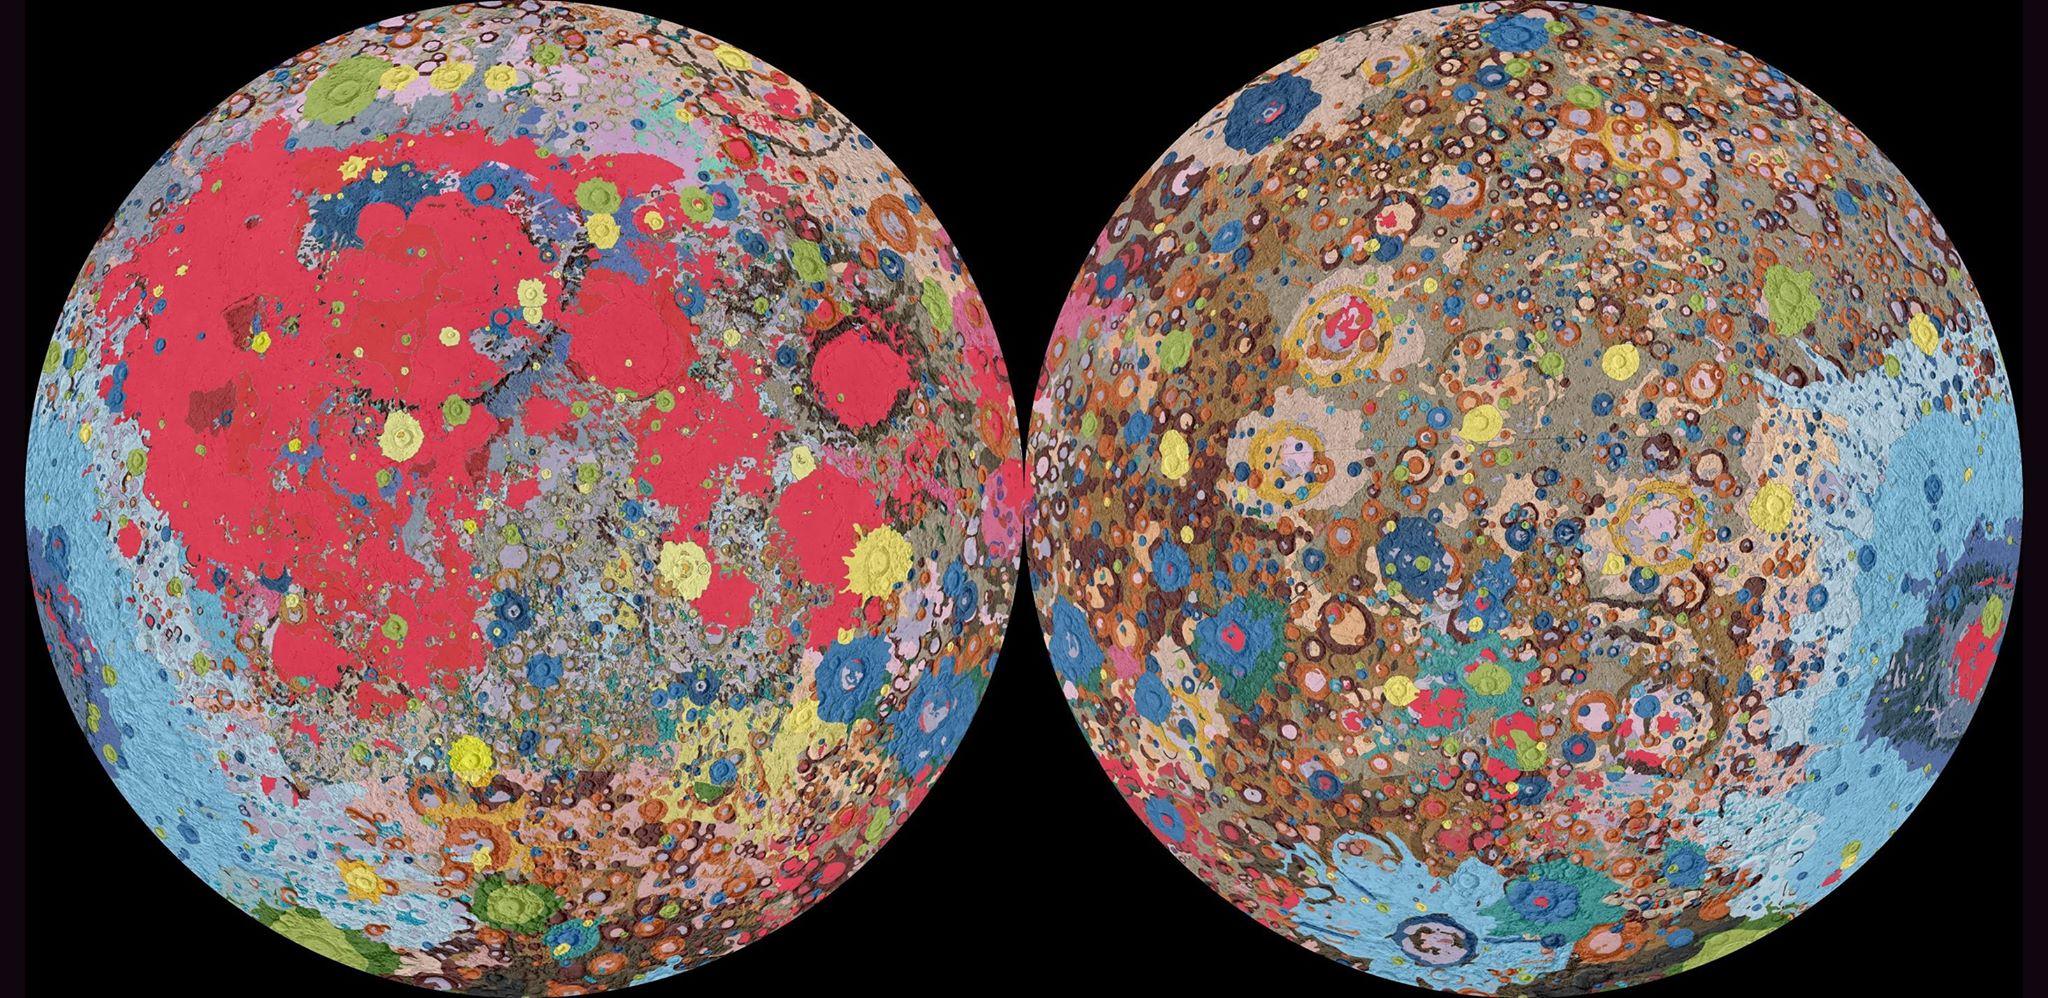 luna-lithosphere-casey-cripe.jpg